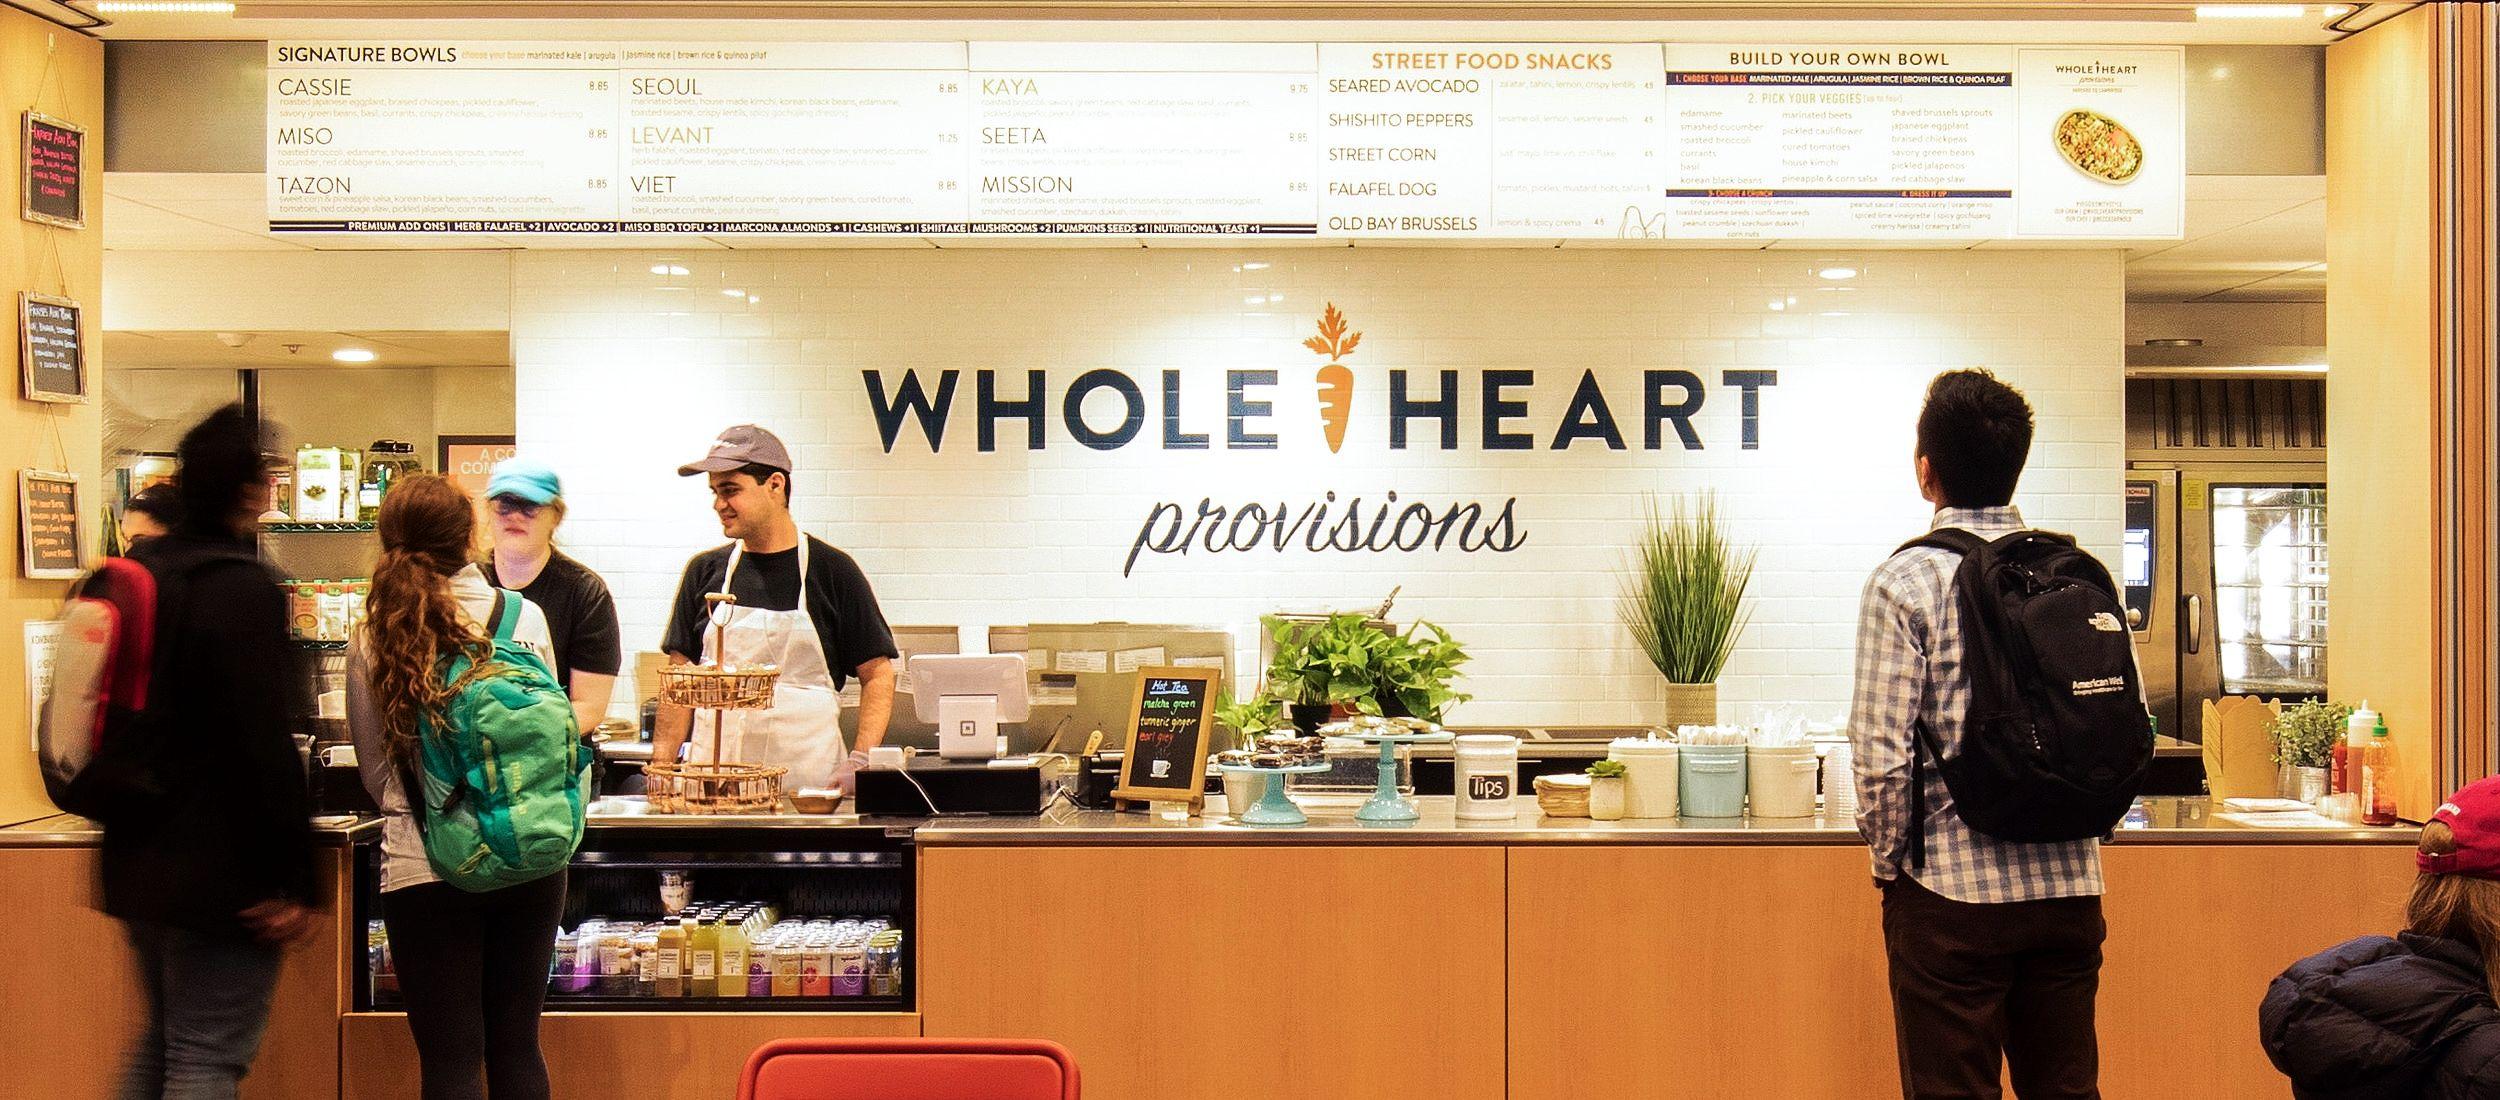 Harvard square whole heart provisions harvard square